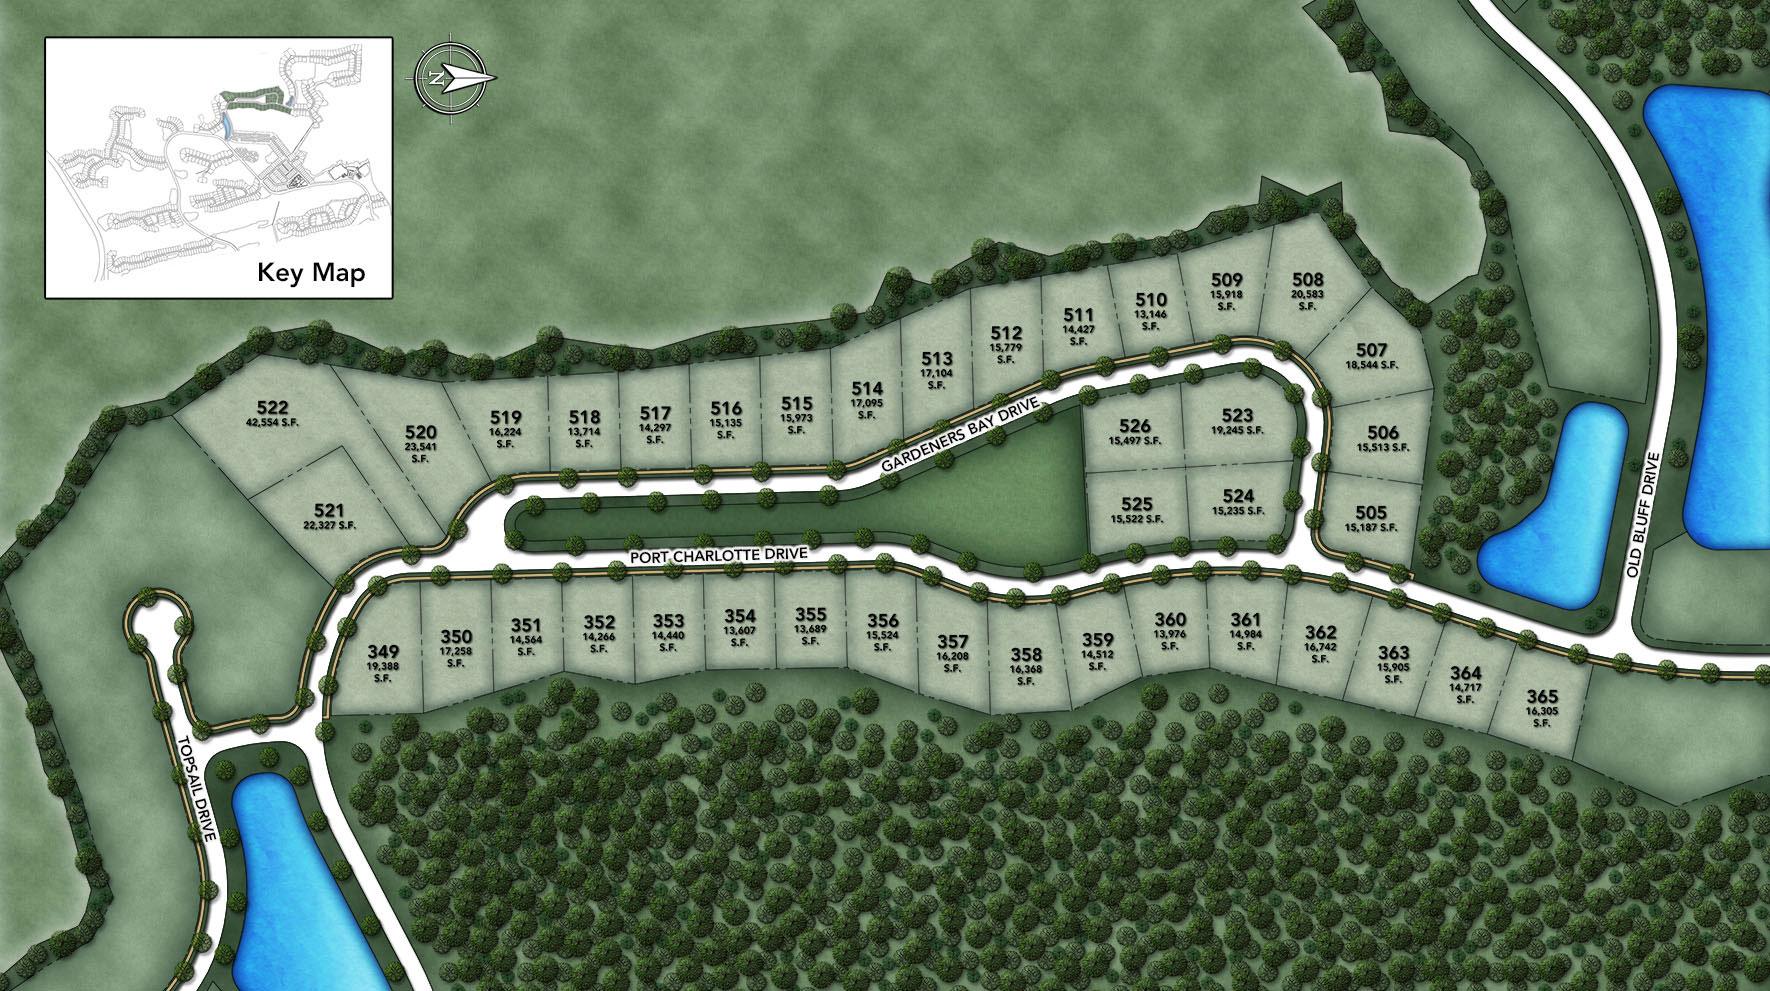 Coastal Oaks at Nocatee - Signature - Gardeners Bay Site Plan